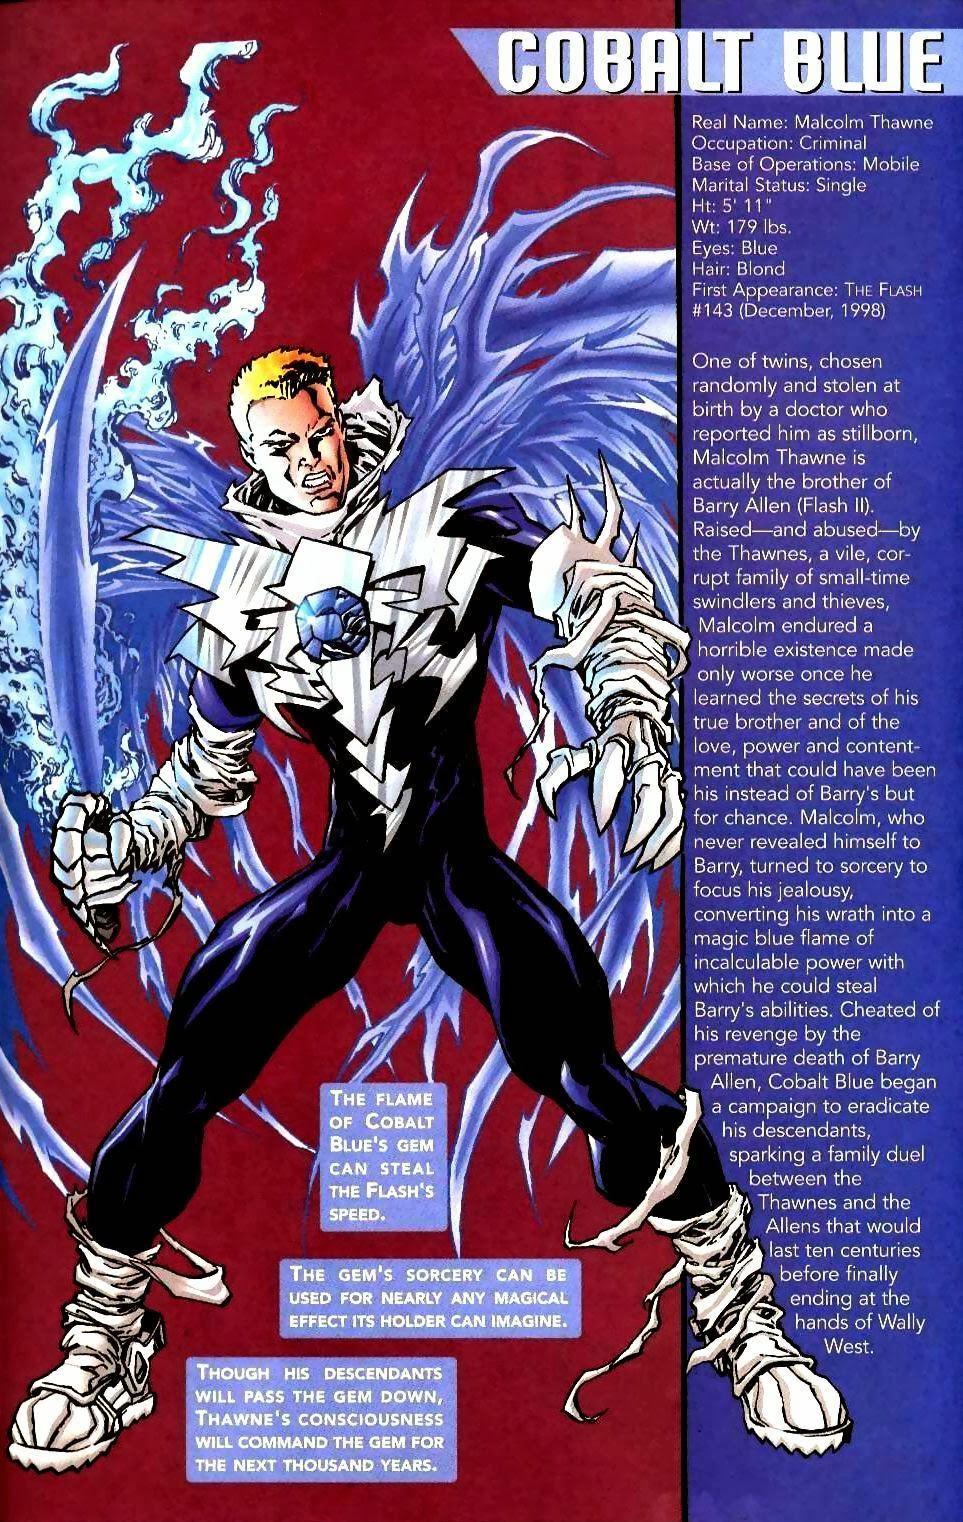 [TV] The Flash - Jay Garrick escolhido! - Página 18 Blue